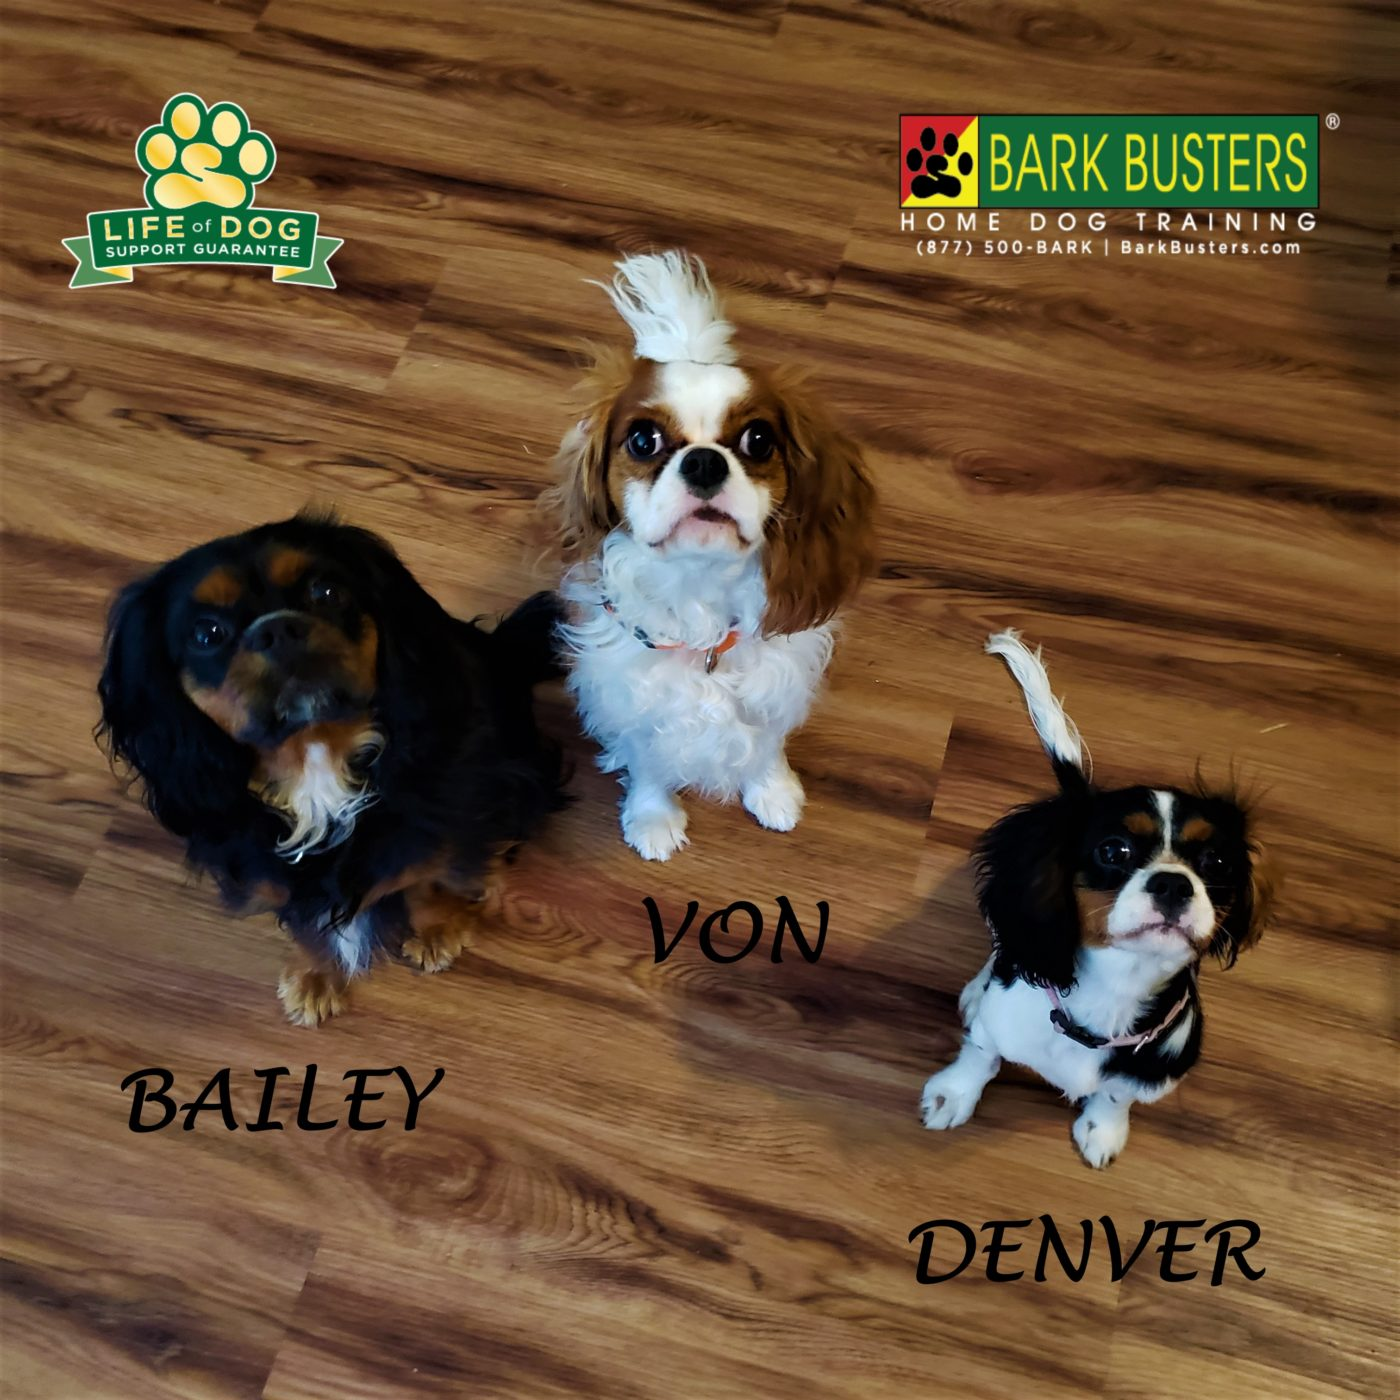 #cavalierkingcharlesspaniel #resourceguarding #leashtraining #puppytraining #dogtrainingaustin #dogtrainernearme #barkbusters #speakdog #inhomedogtraining